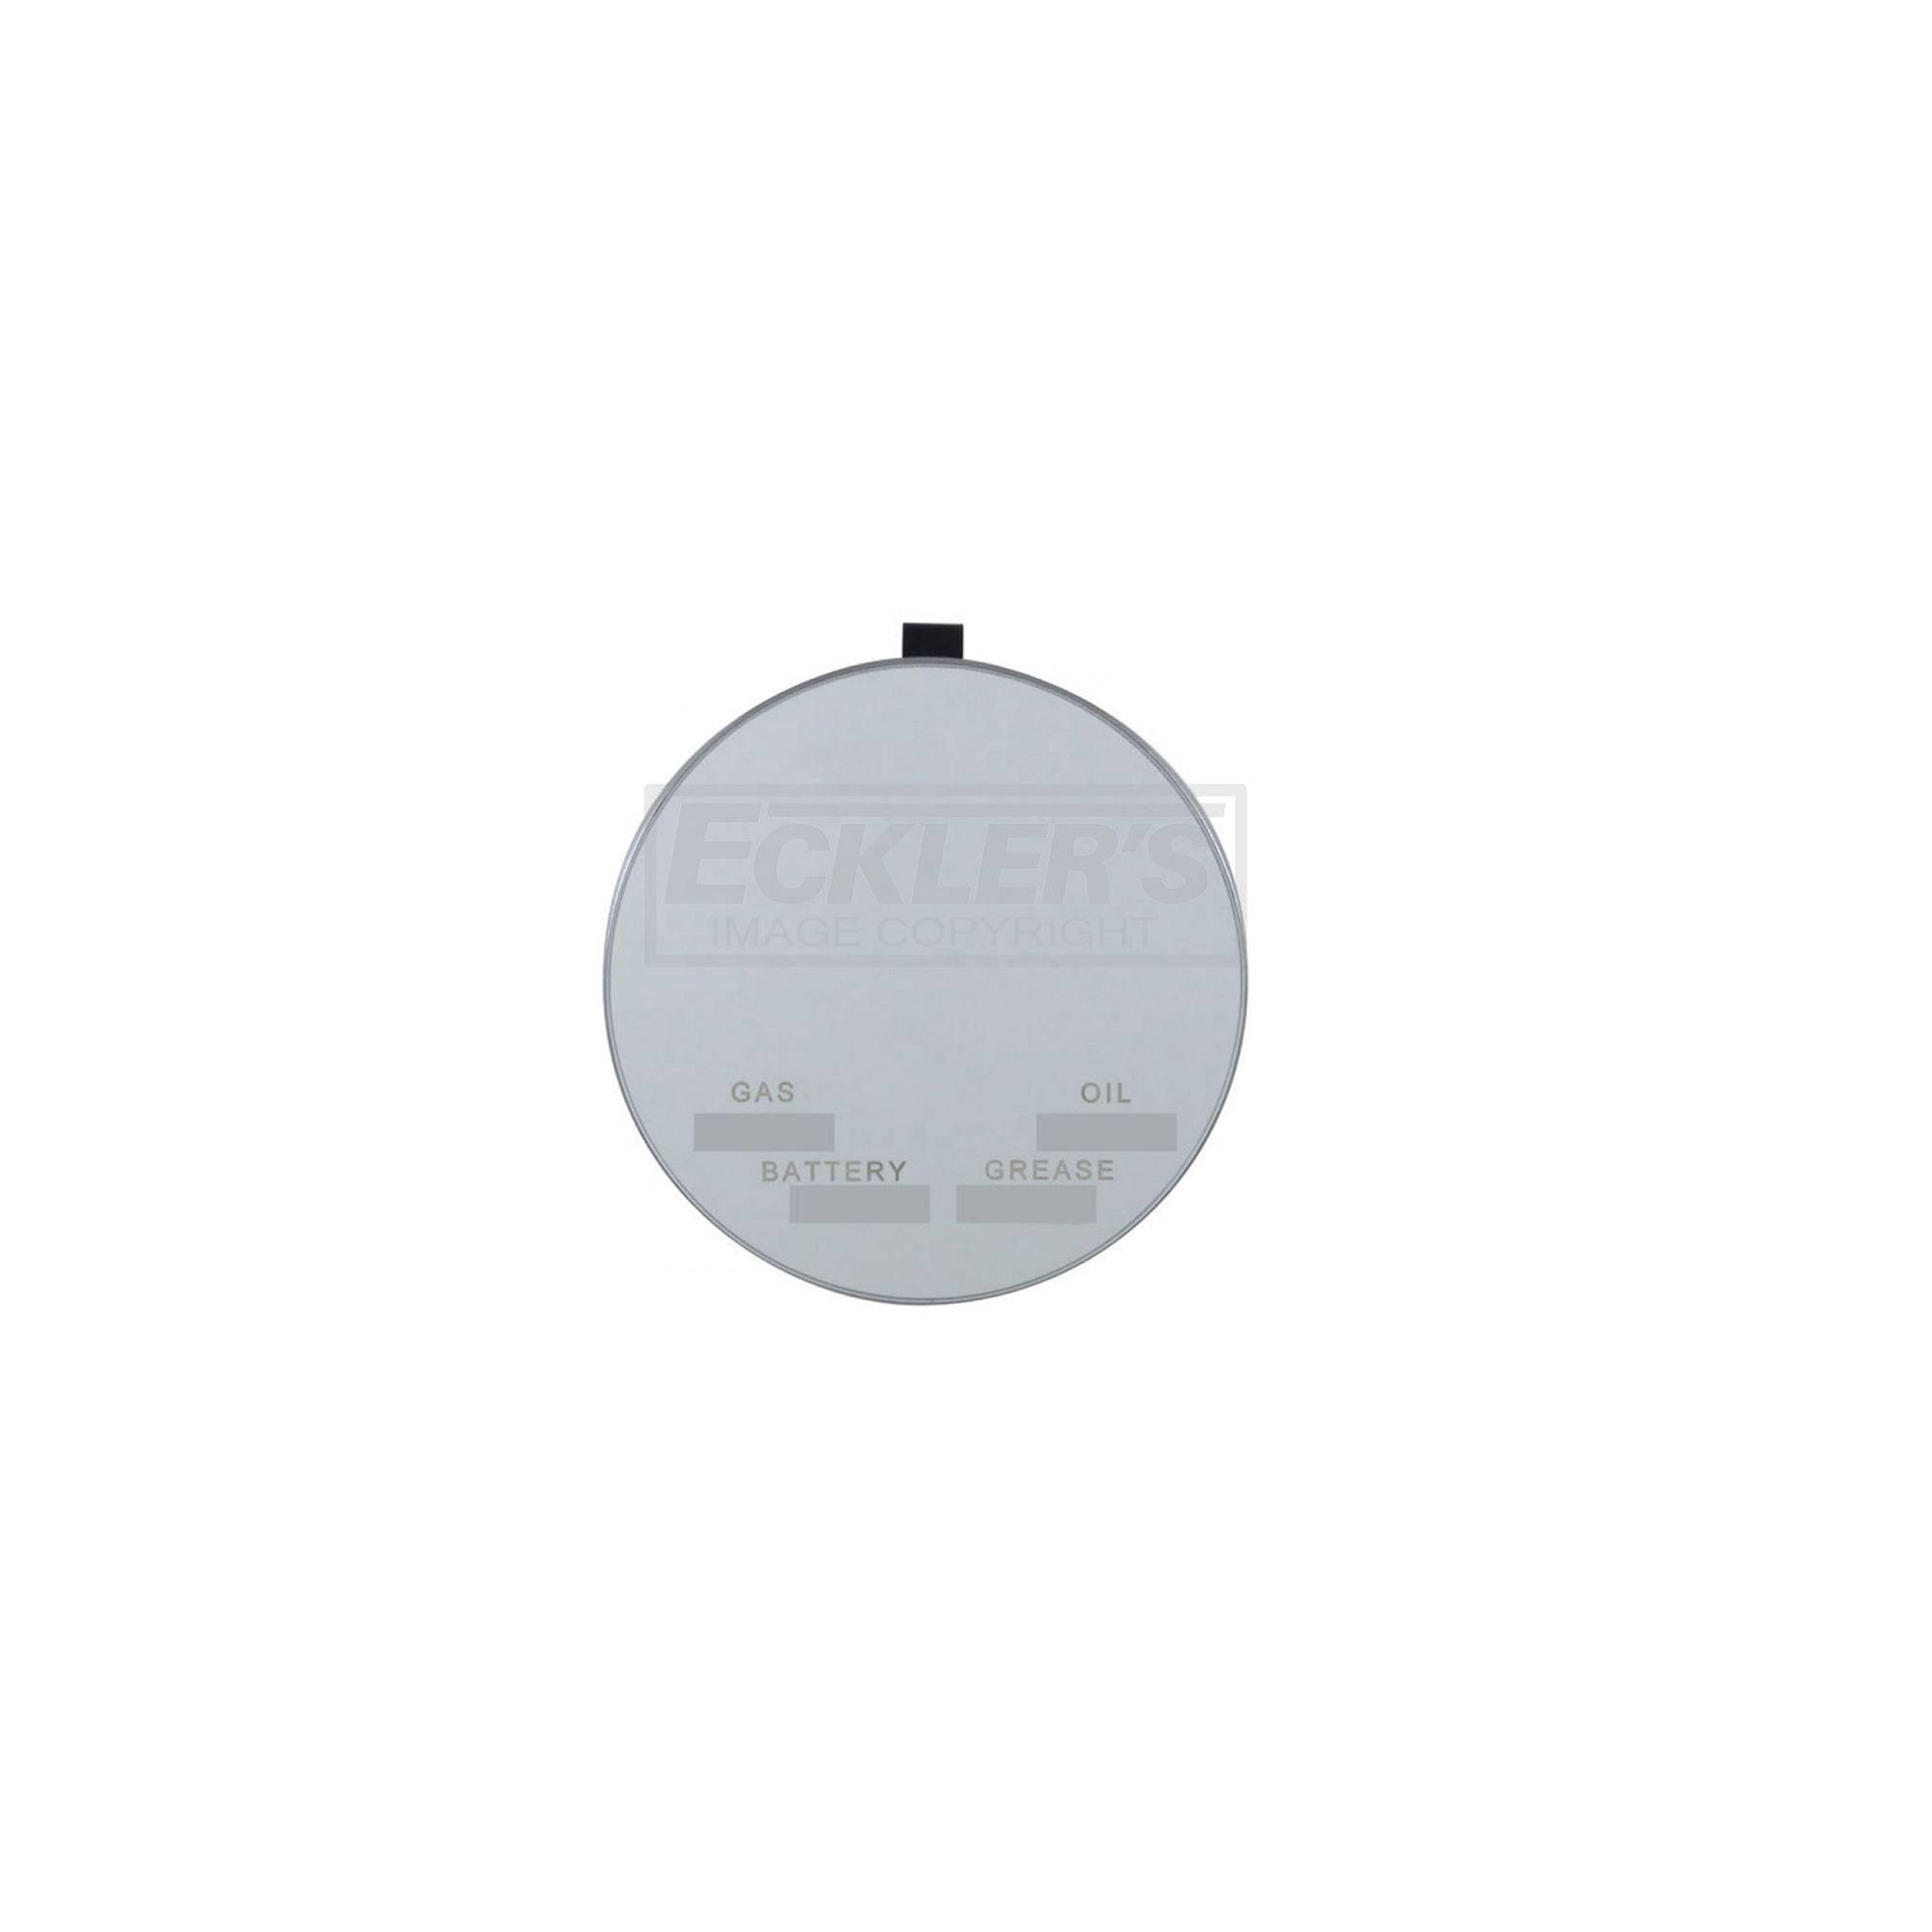 144 x A6 Sheets Hunkydory Stunning Silver Mirri-Mats